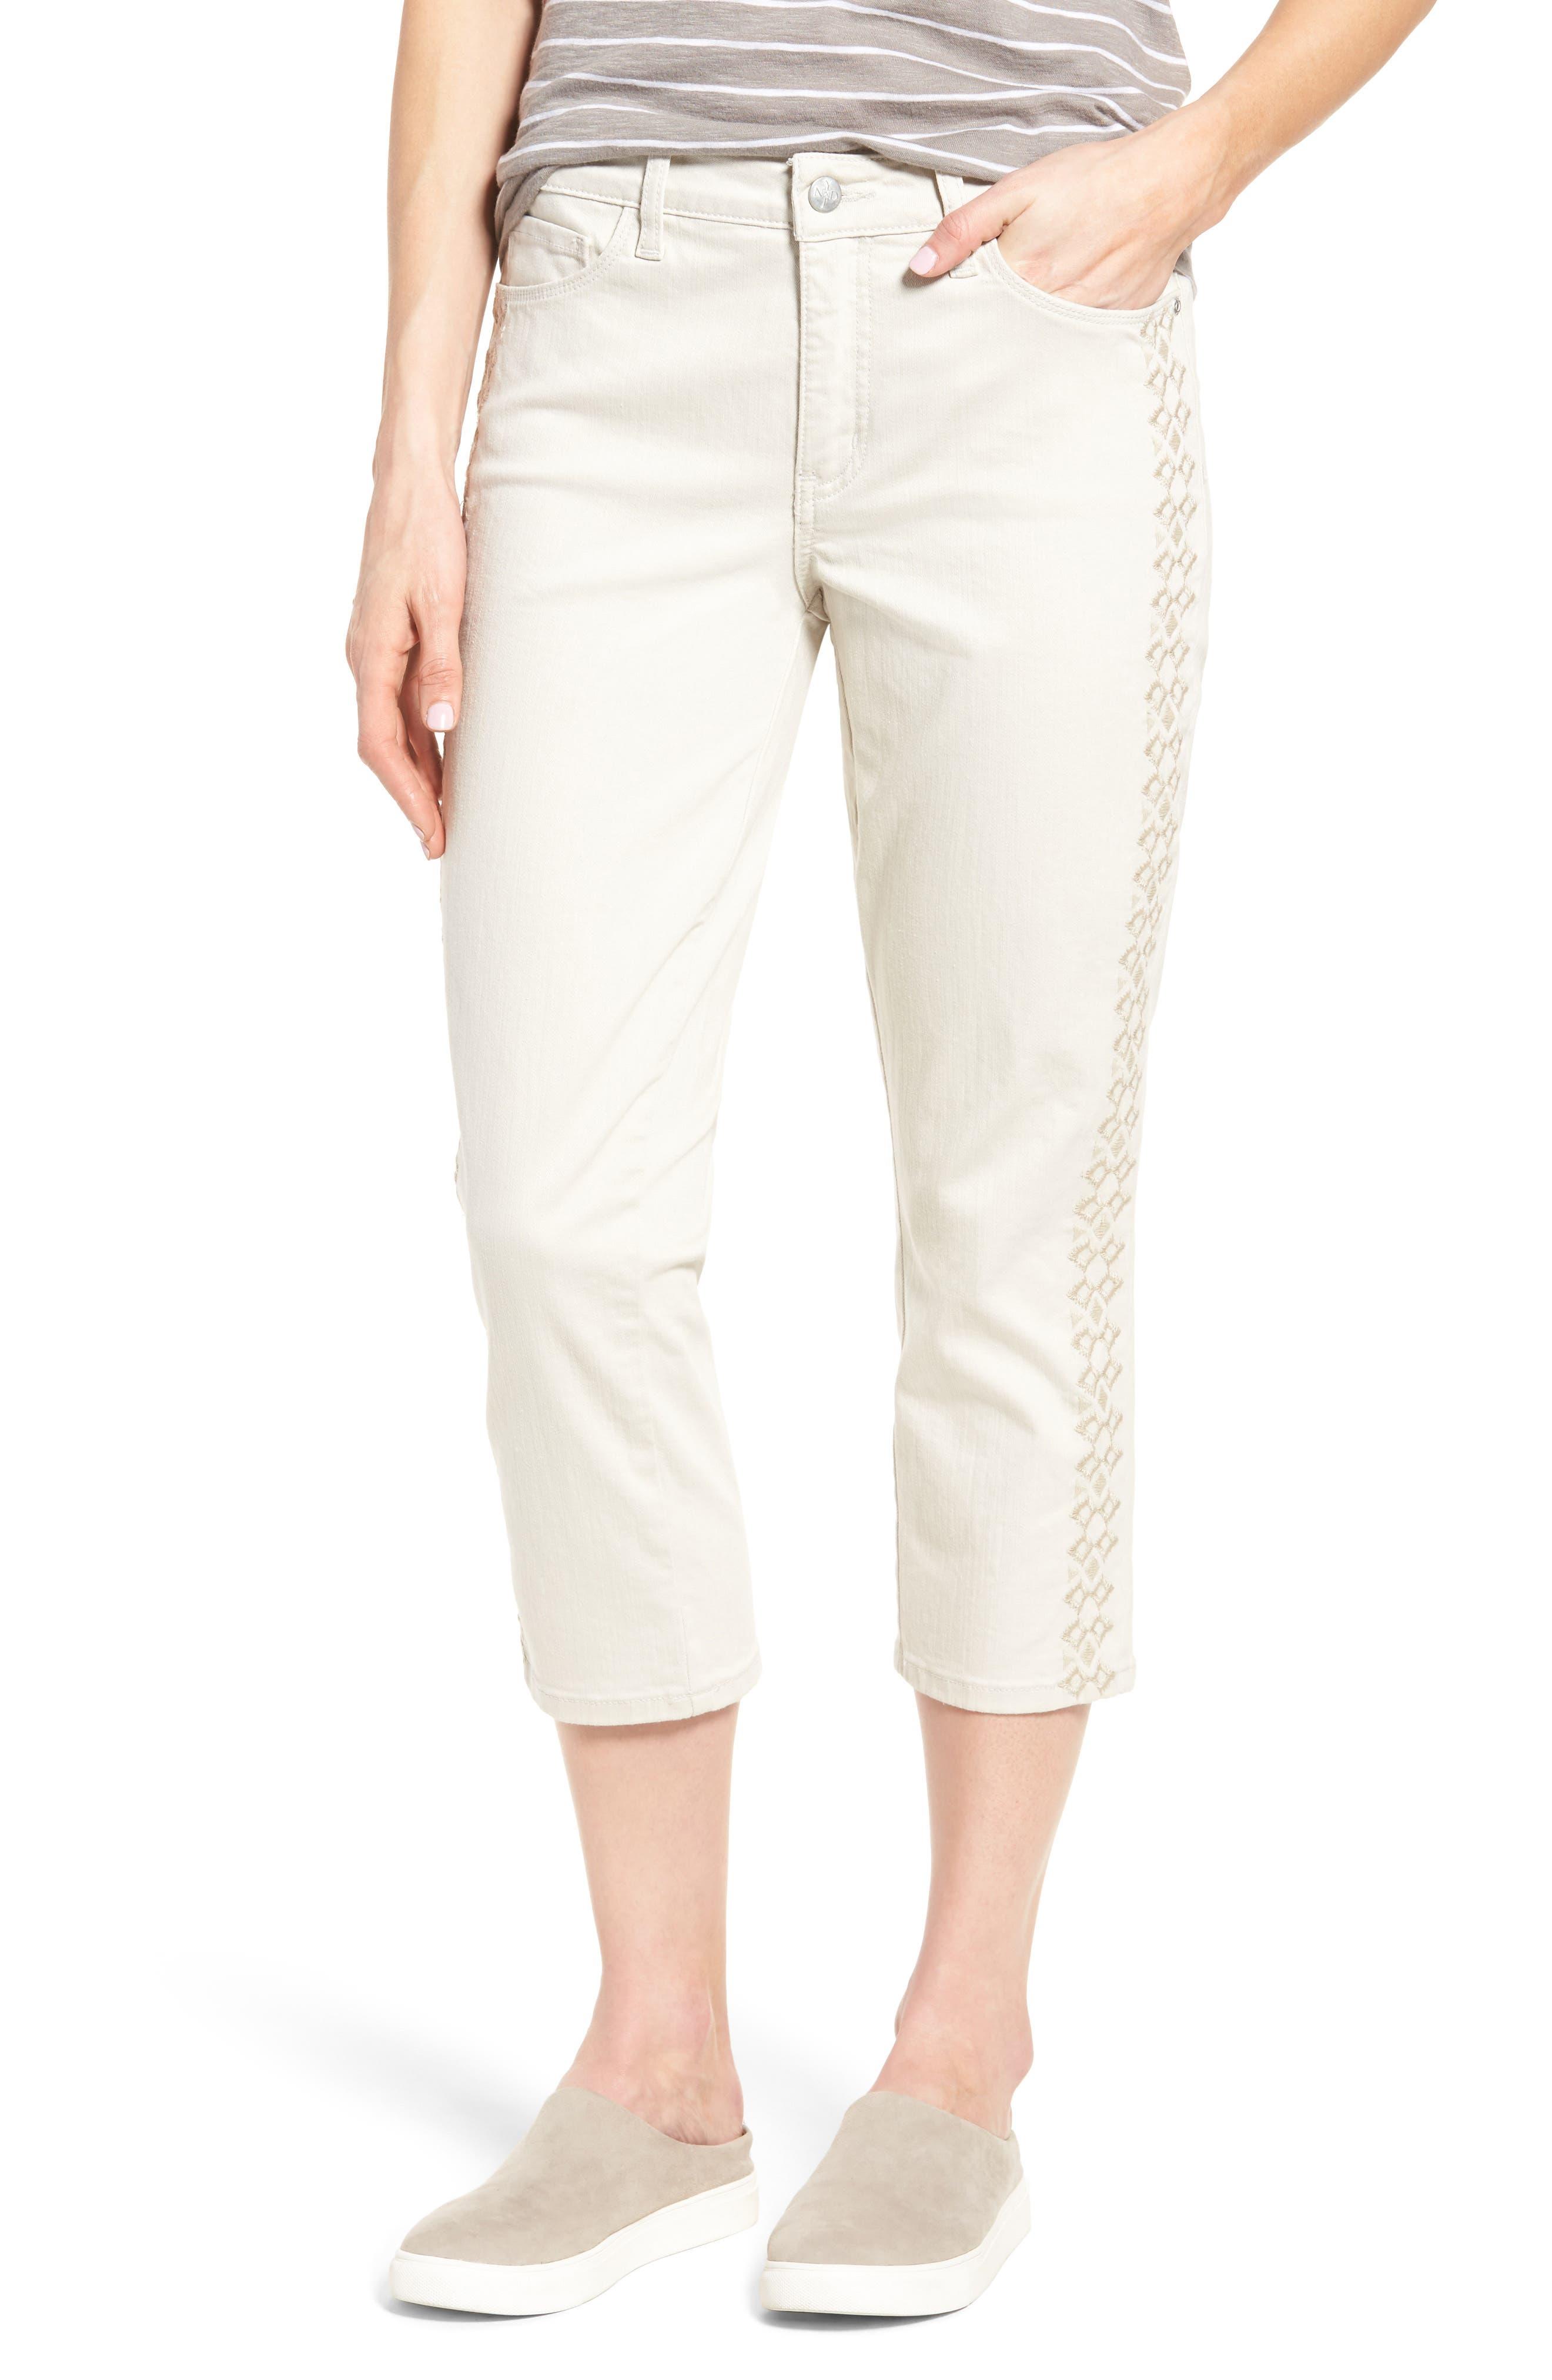 NYDJ Alina Embroidered Stretch Capri Jeans